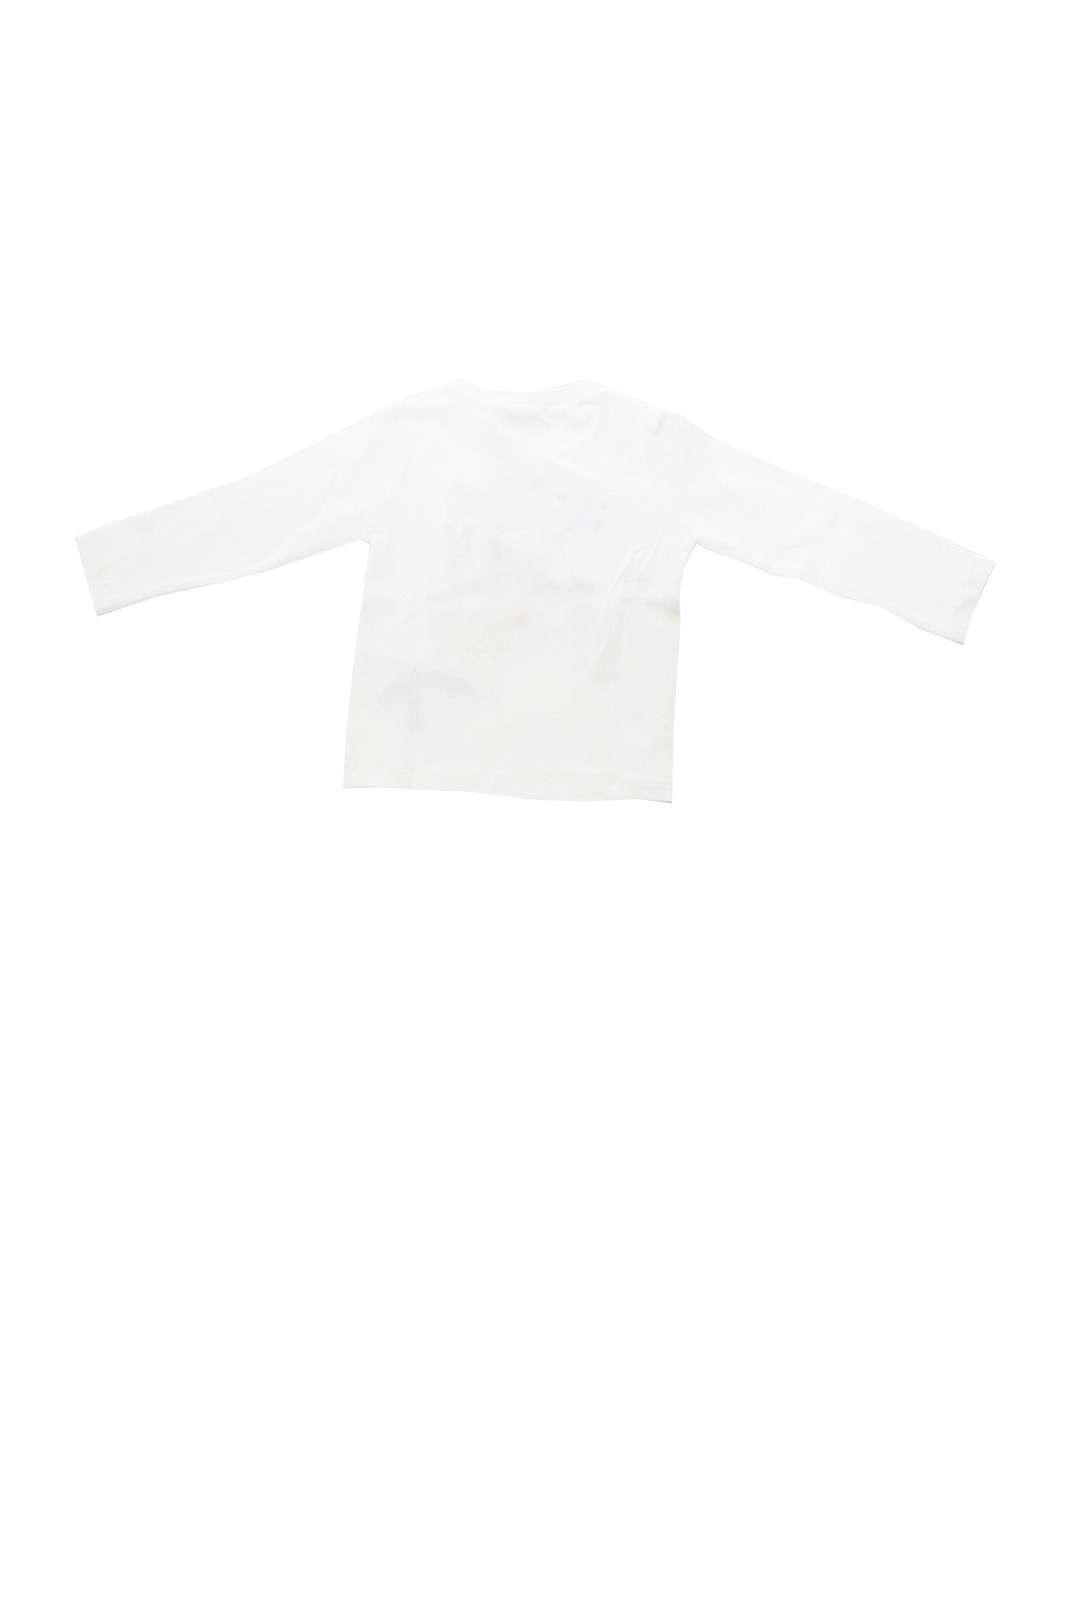 https://www.parmax.com/media/catalog/product/a/i/PE-outlet_parmax-maglia-bambina-Liu-Jo-k66018-B.jpg